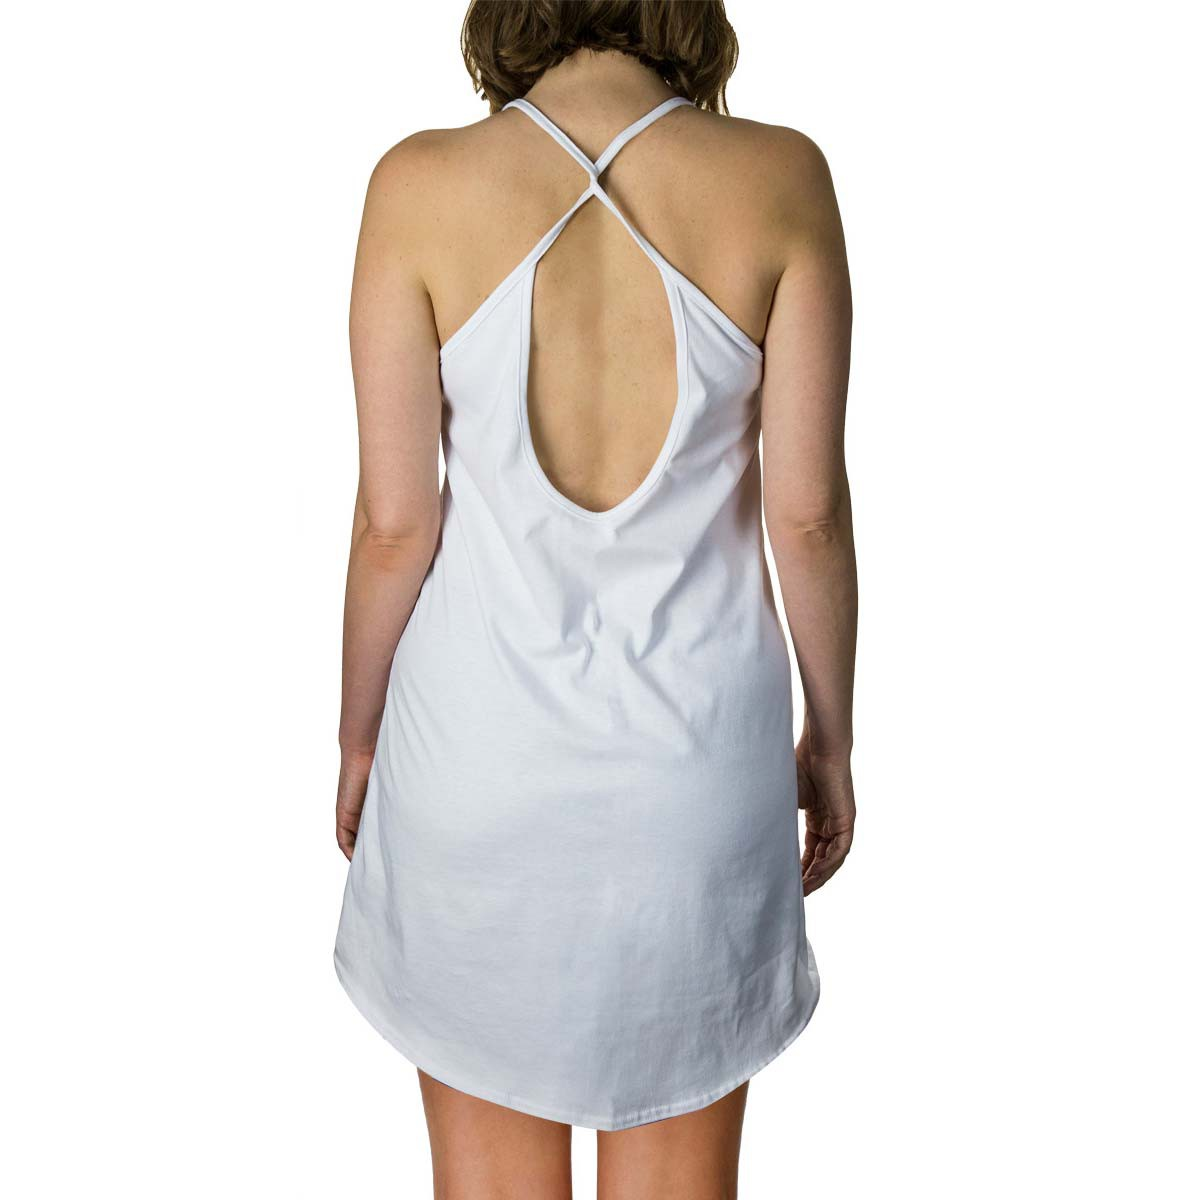 Corona Extra Halter Top White Ladies Tank Top Dress